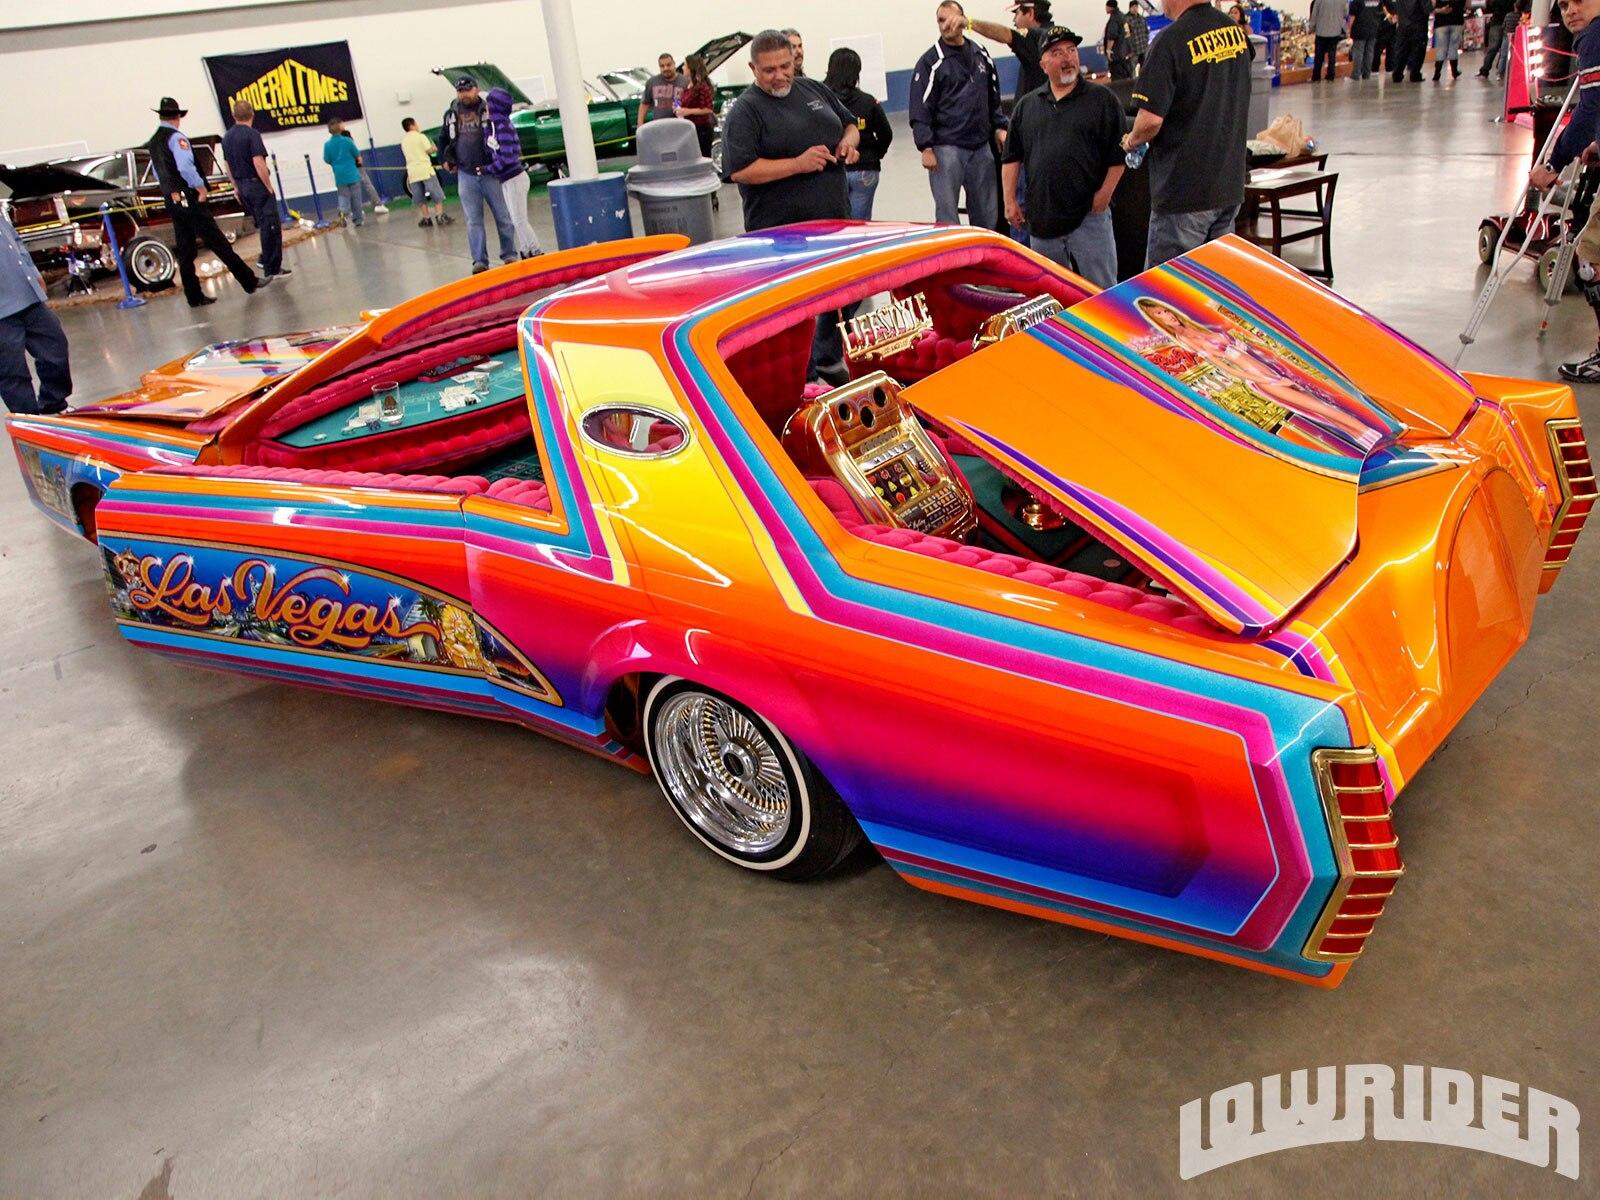 1305-41st-tejano-super-car-show-las-vegas-lifestyle - Lowrider